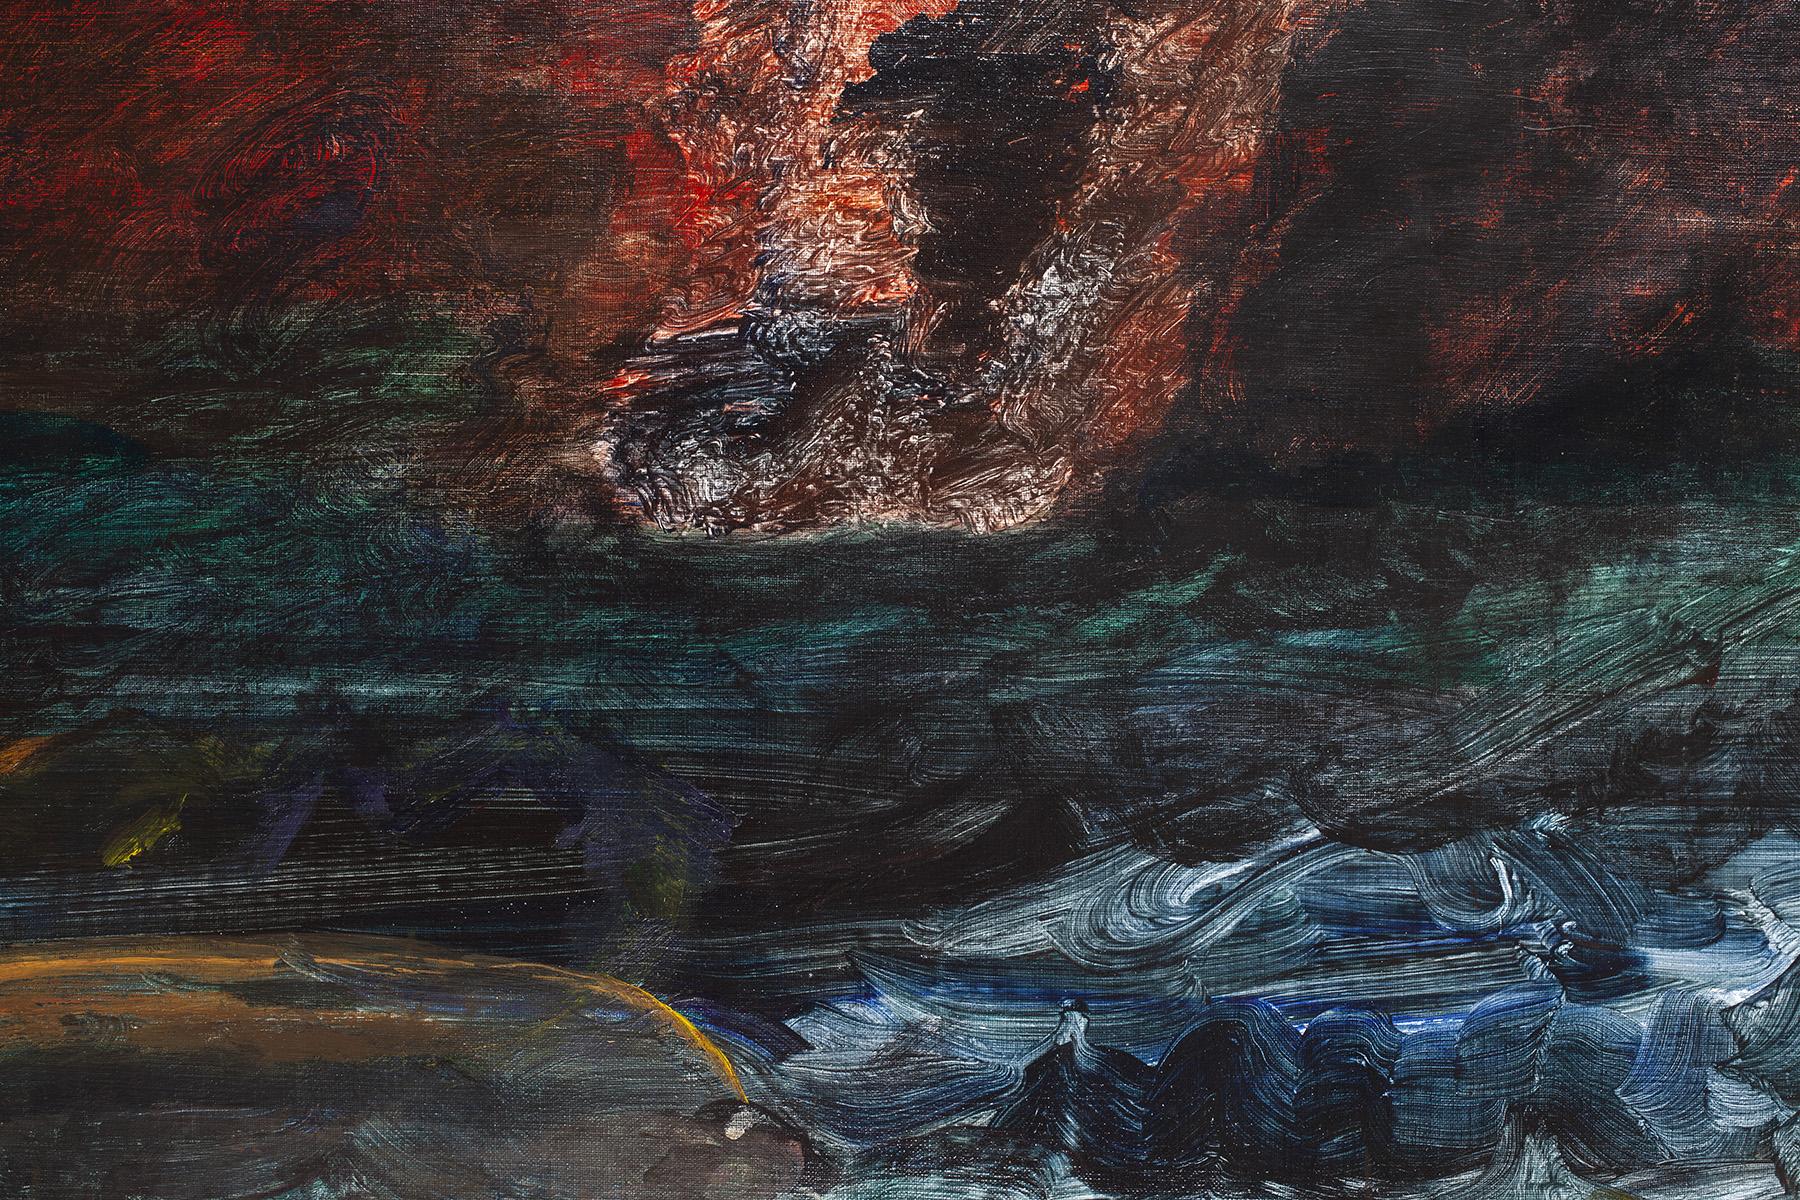 10.) Ono, Boat Sinking. 2018.  Acrylic on canvas, 38.25 in x 53 in (97.2 cm x 134.6 cm) copy.jpg